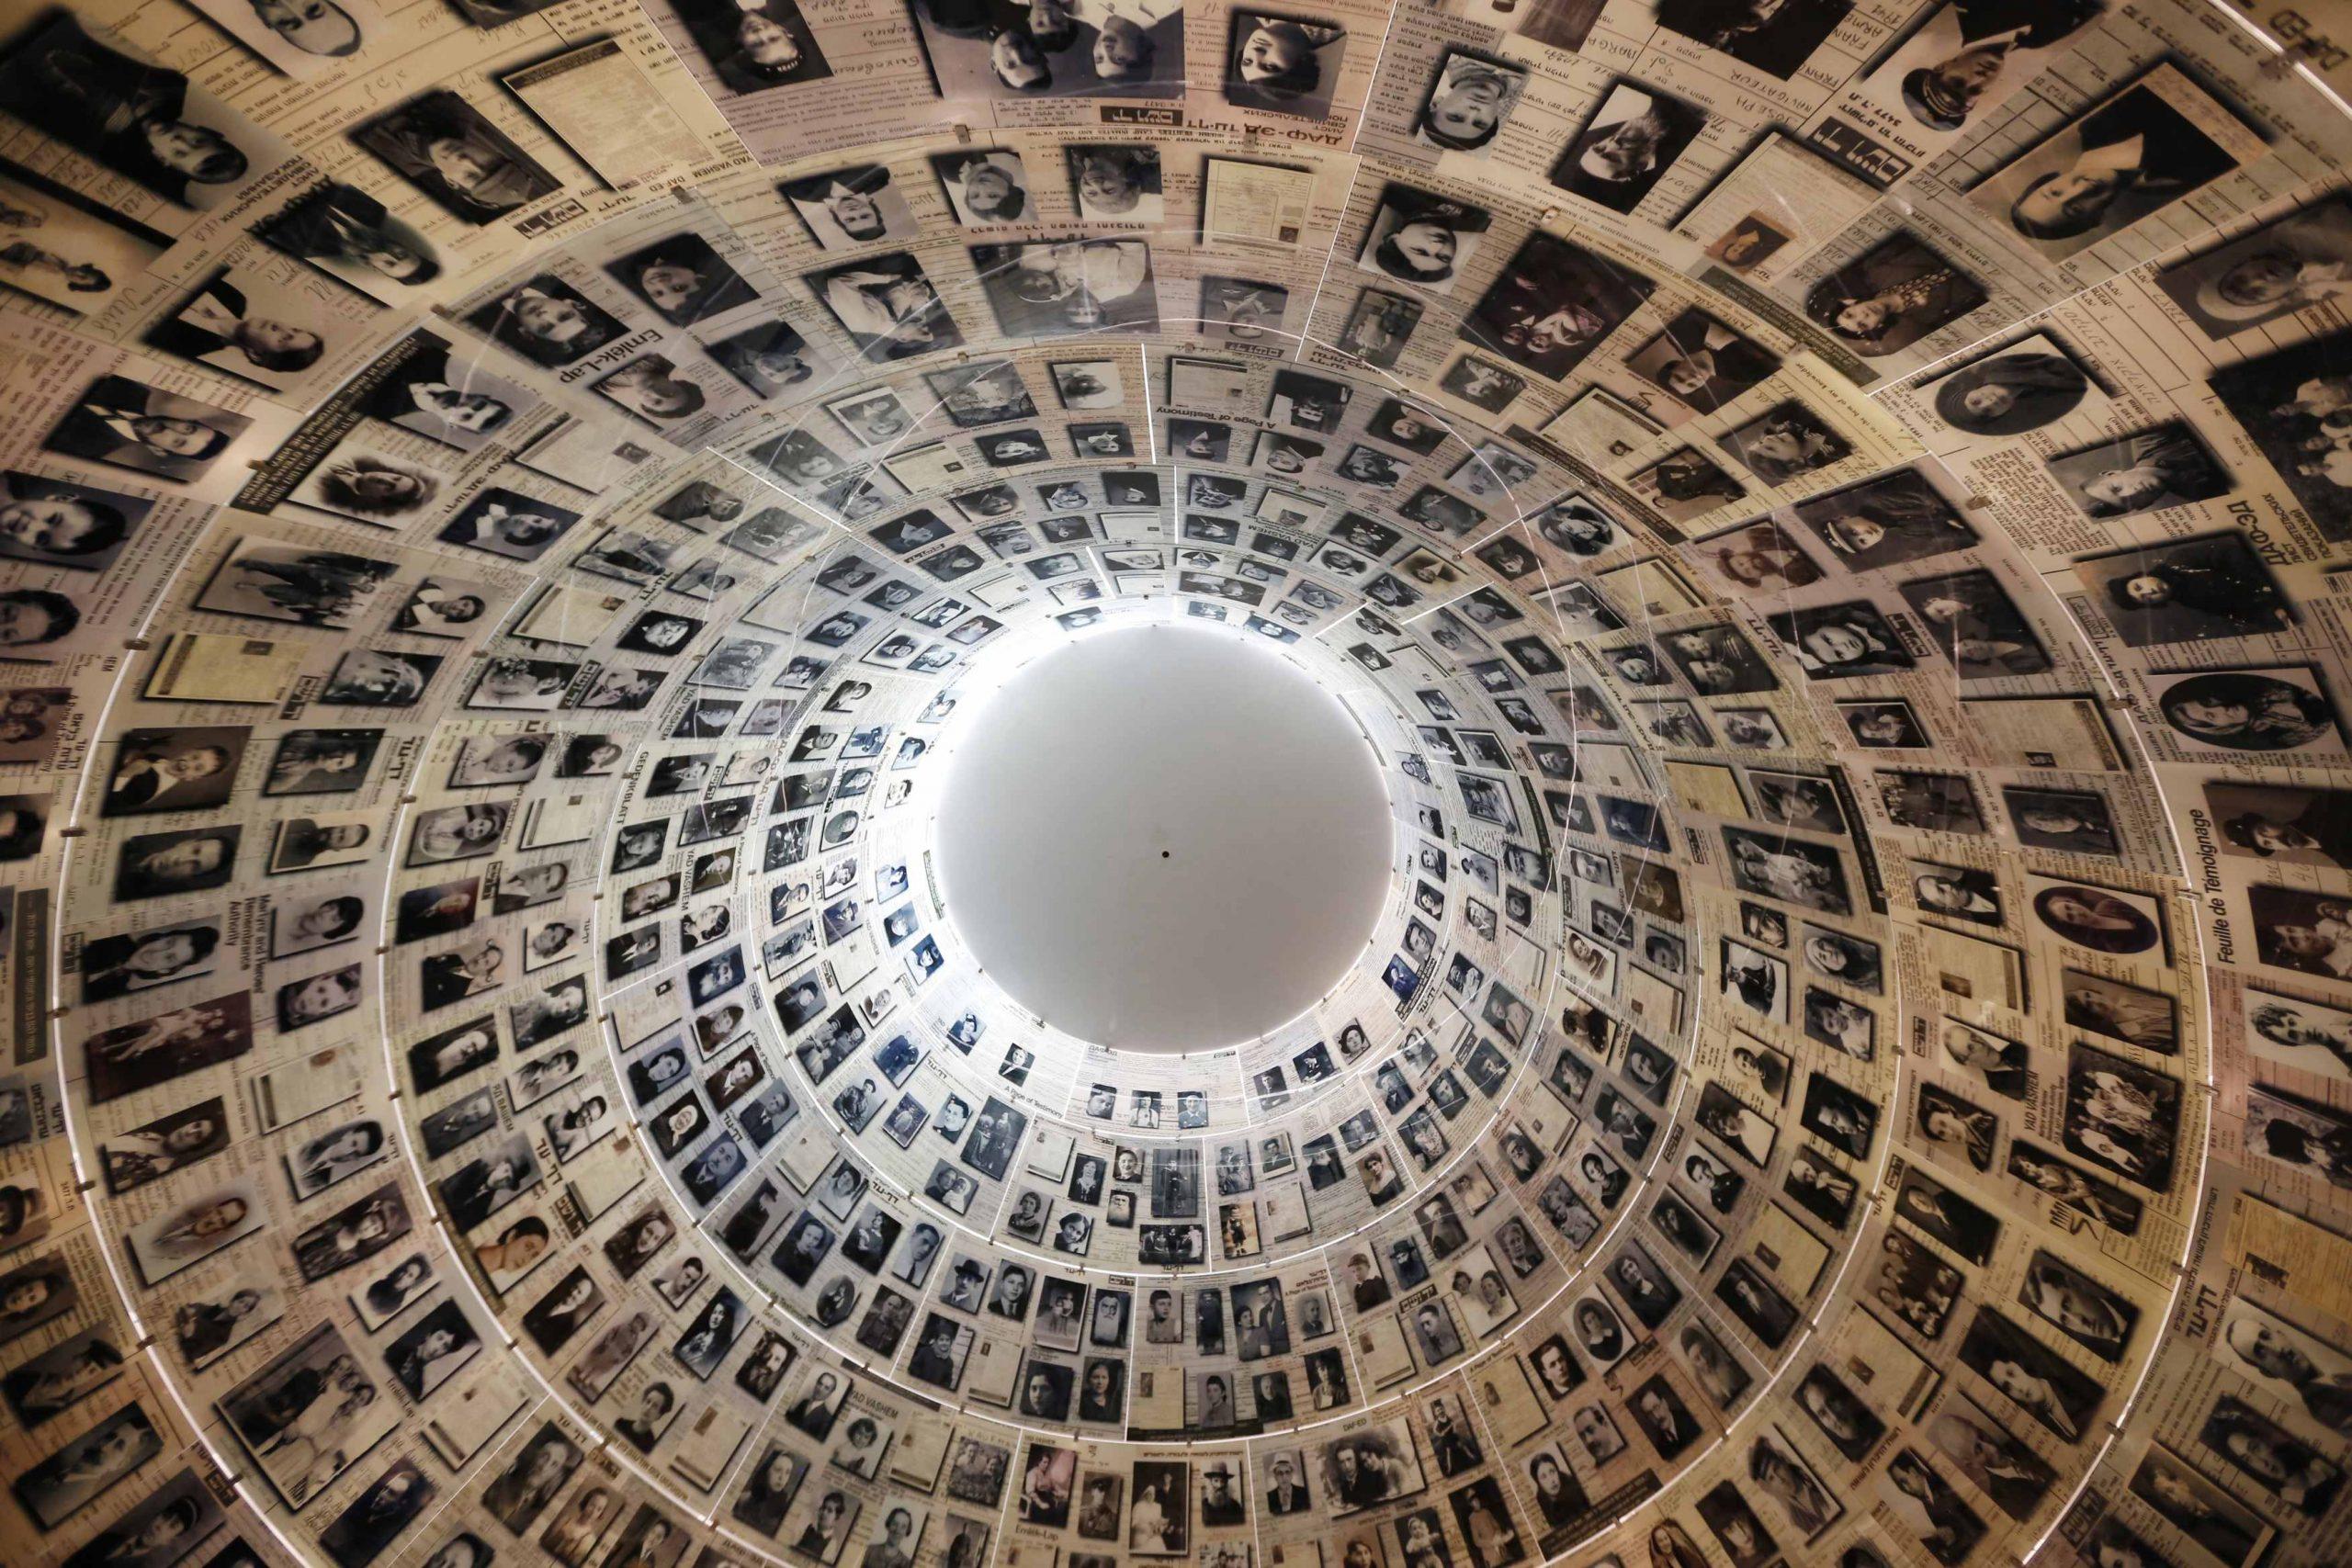 Yad Vashem Holocaust Memorial in Jerusalem, March 22, 2013. REUTERS/Jason Reed